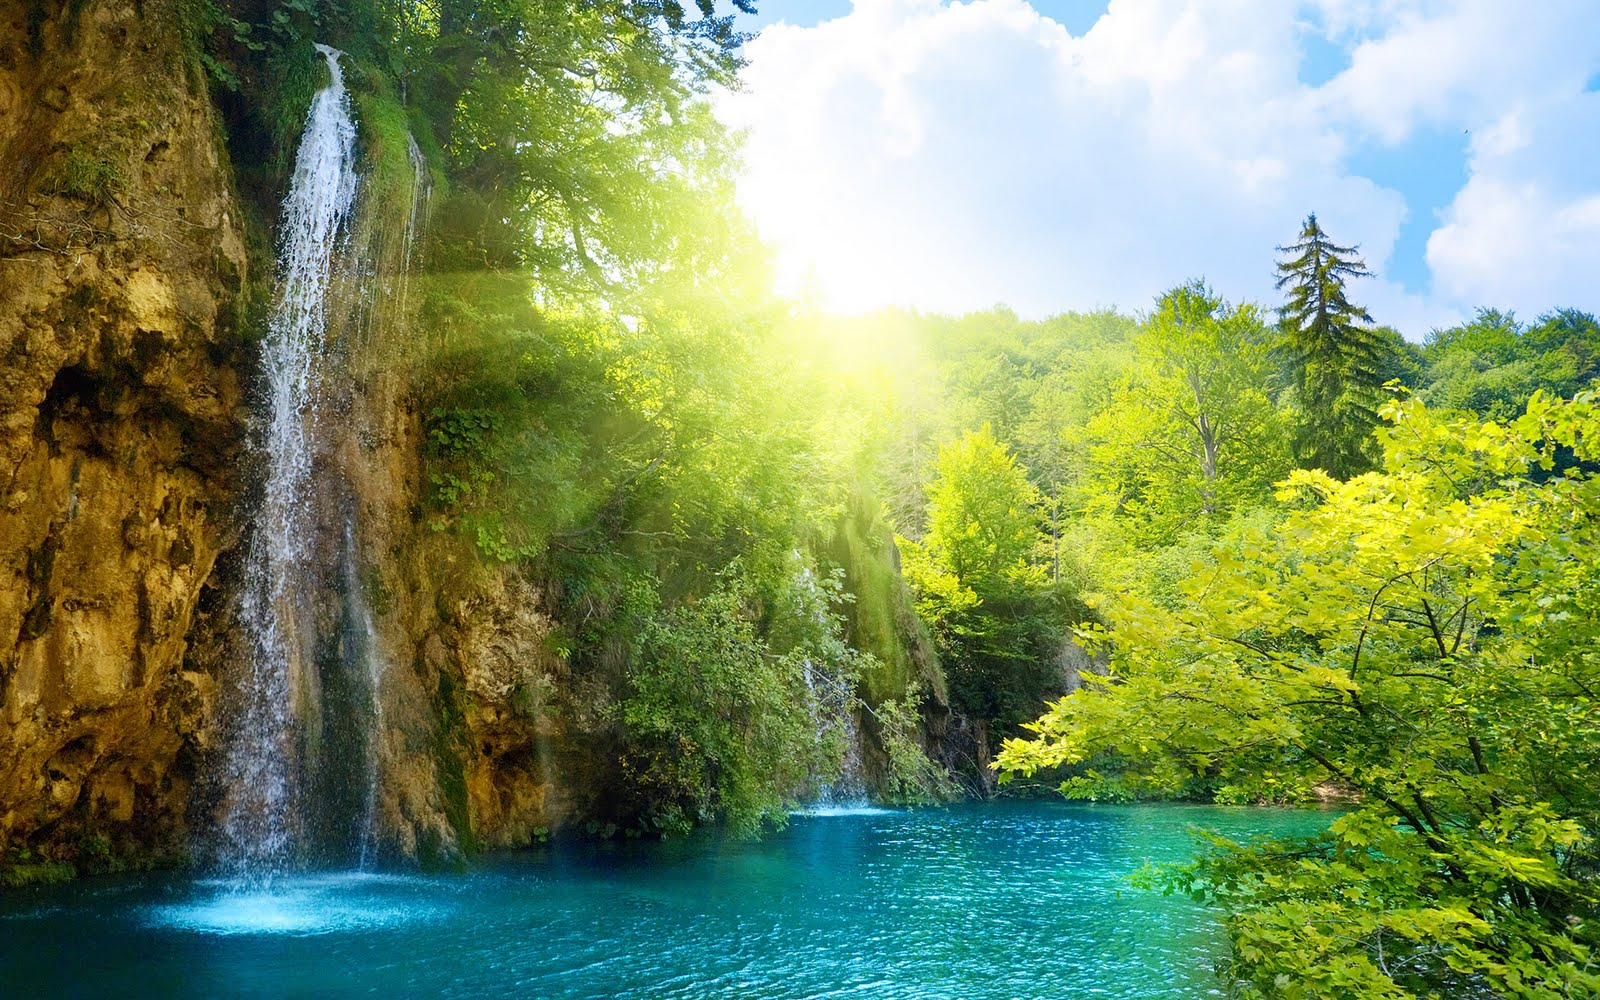 Hd NatureHd wallpaper beautiful nature ON SOFT 1600x1000